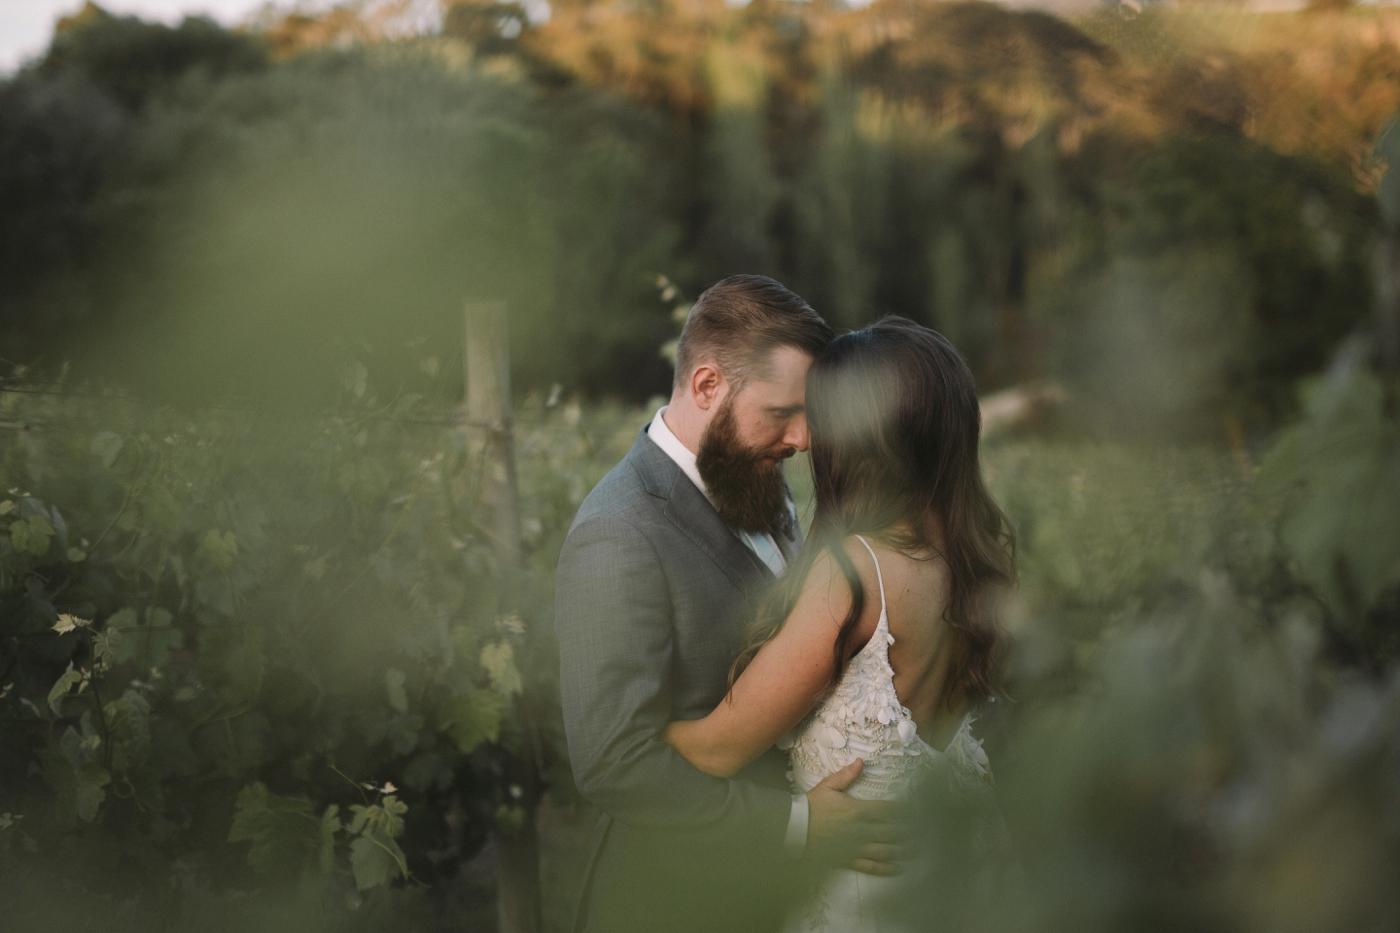 Maddy & Wes - K1 by Geoff Hardy Wedding - Adelaide Wedding Photographer - Natural wedding photography in Adelaide - Katherine Schultz_0067.jpg